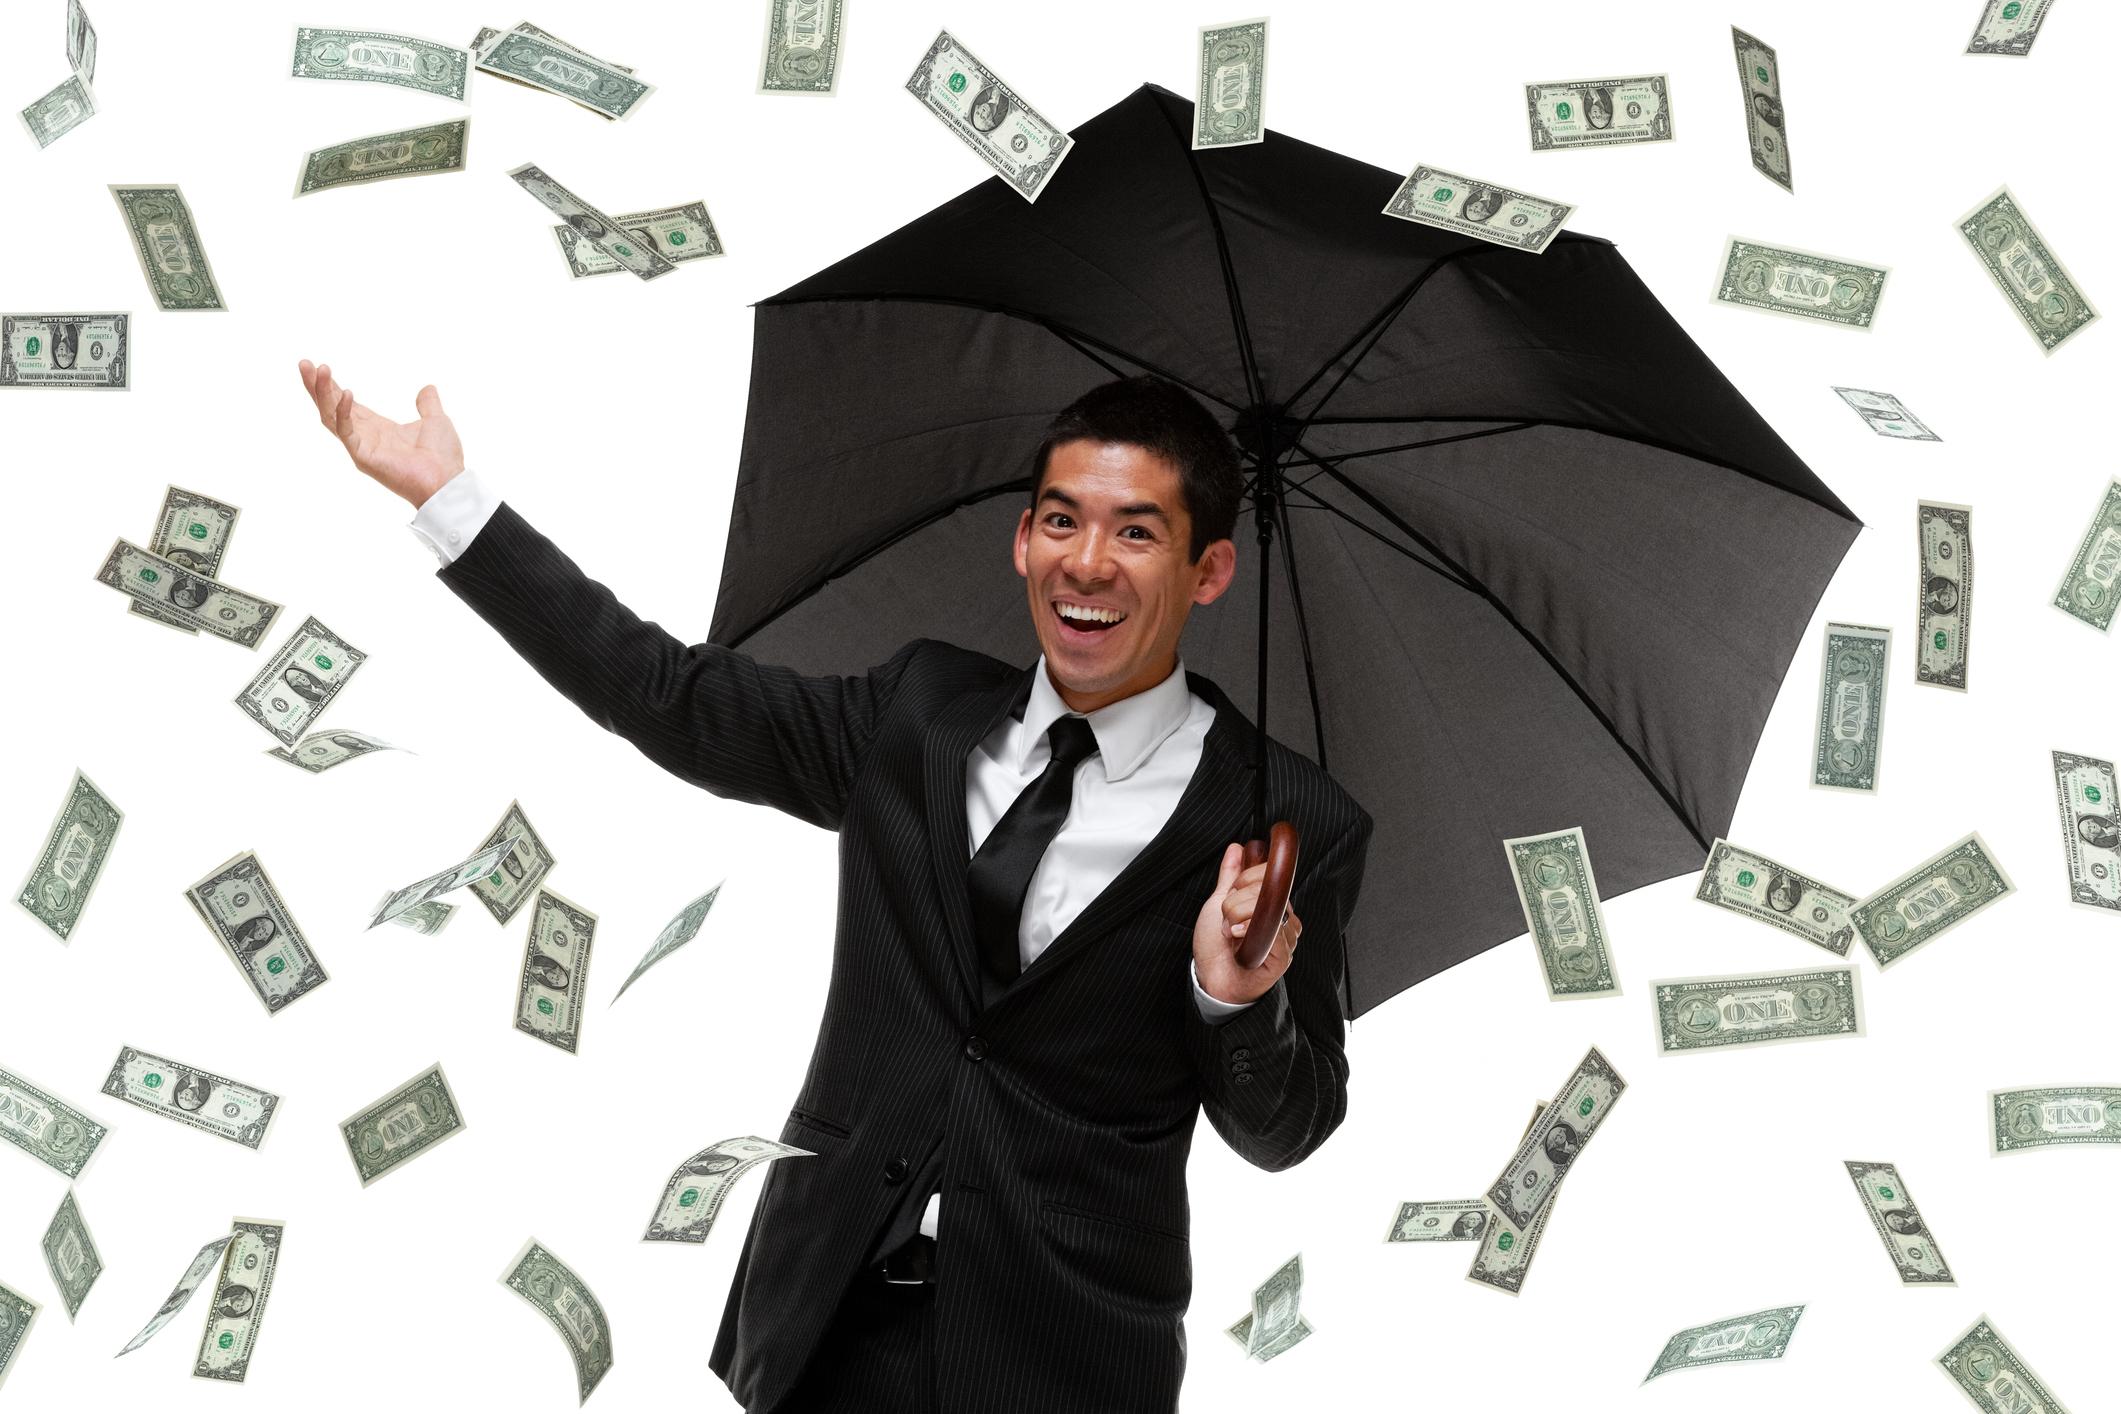 Money raining down on businessman with an umbrella.